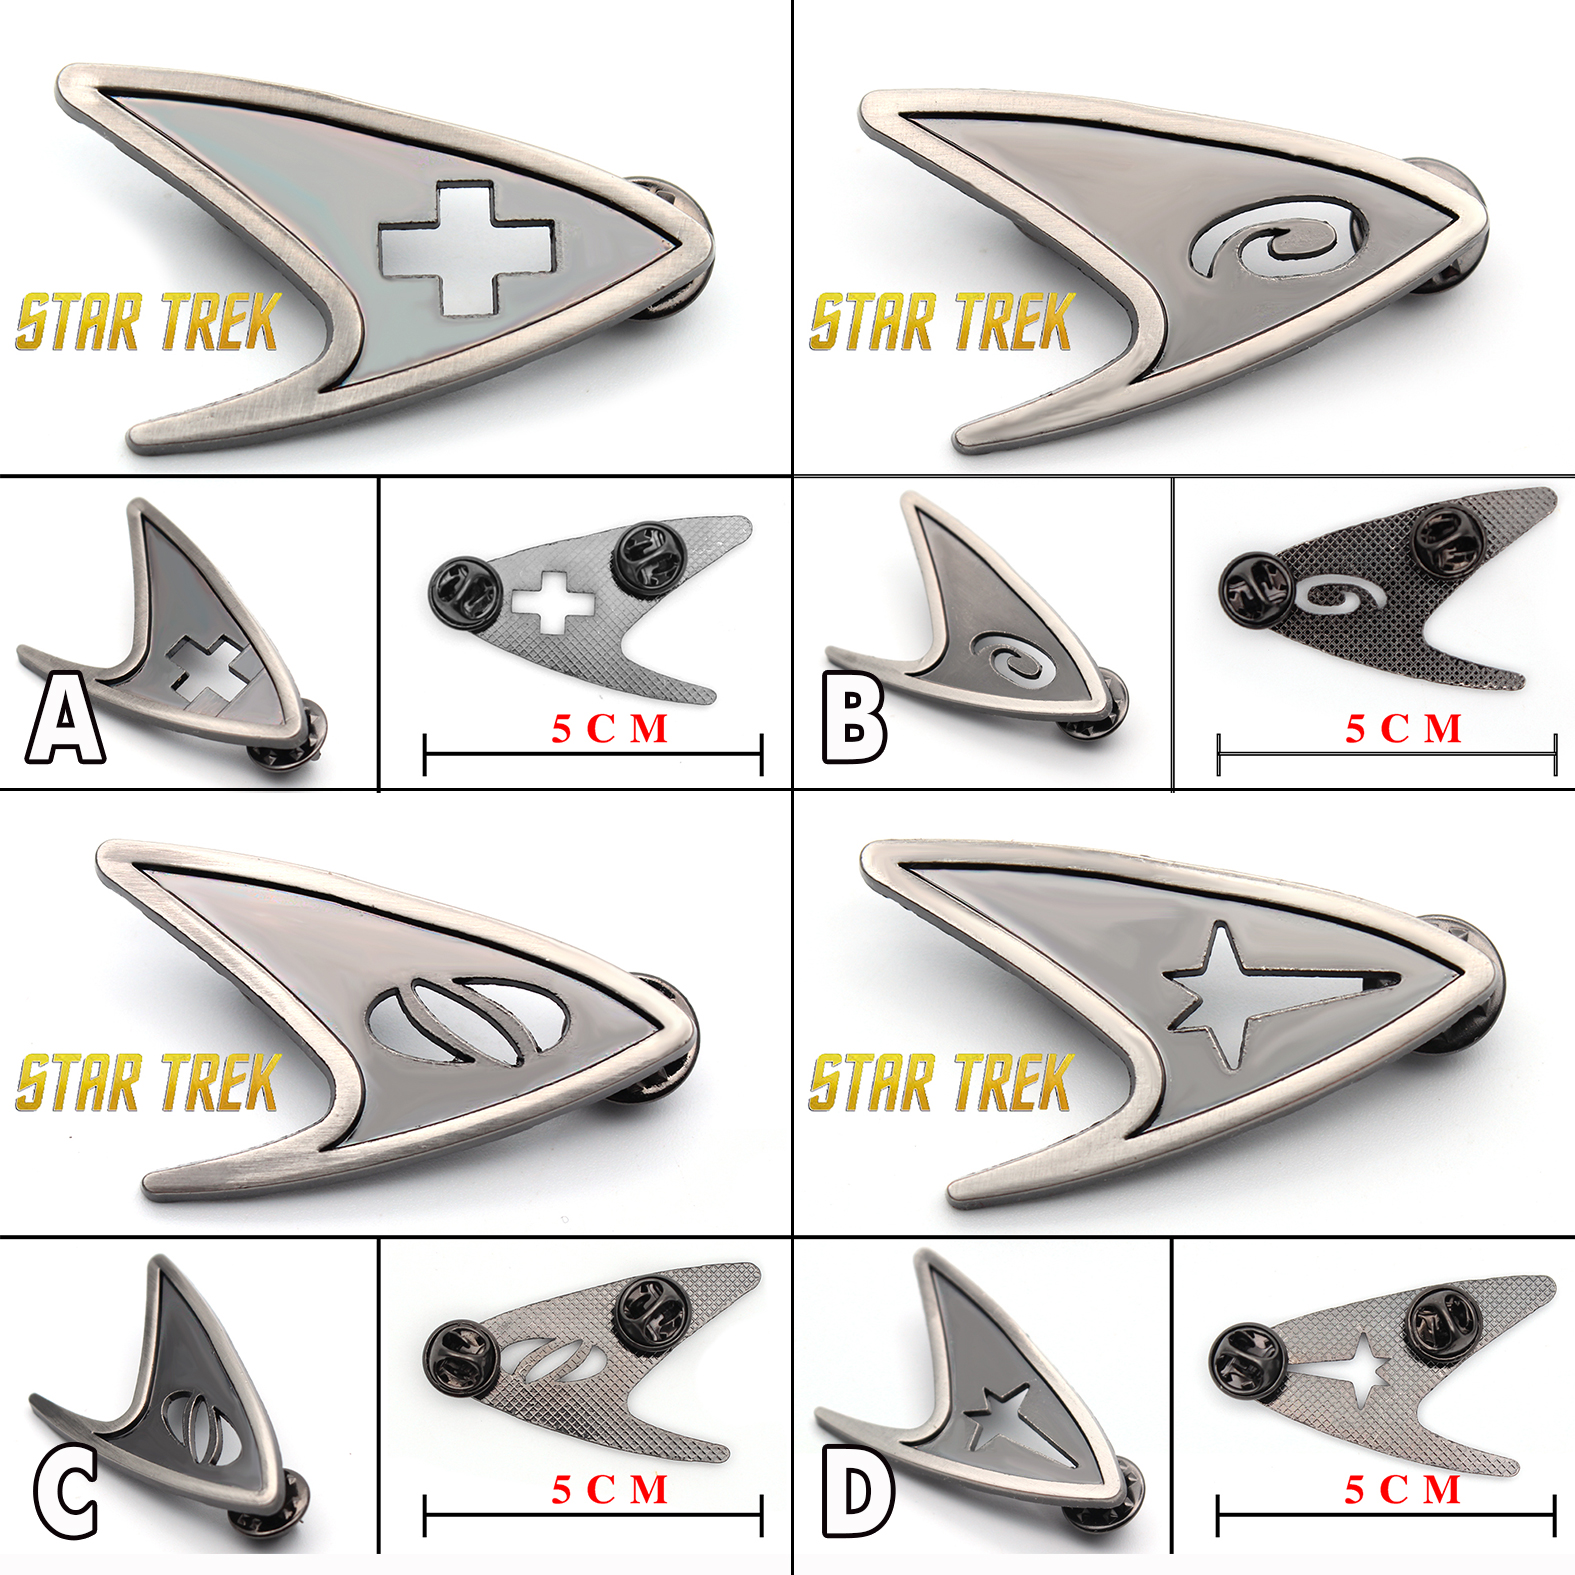 Giancomics 4PCS Star Trek insignia Starfleet Metal Zinc Alloy Badge Pin Brooch Pin Chestpin Odd Shape Accessory Ornament Gift